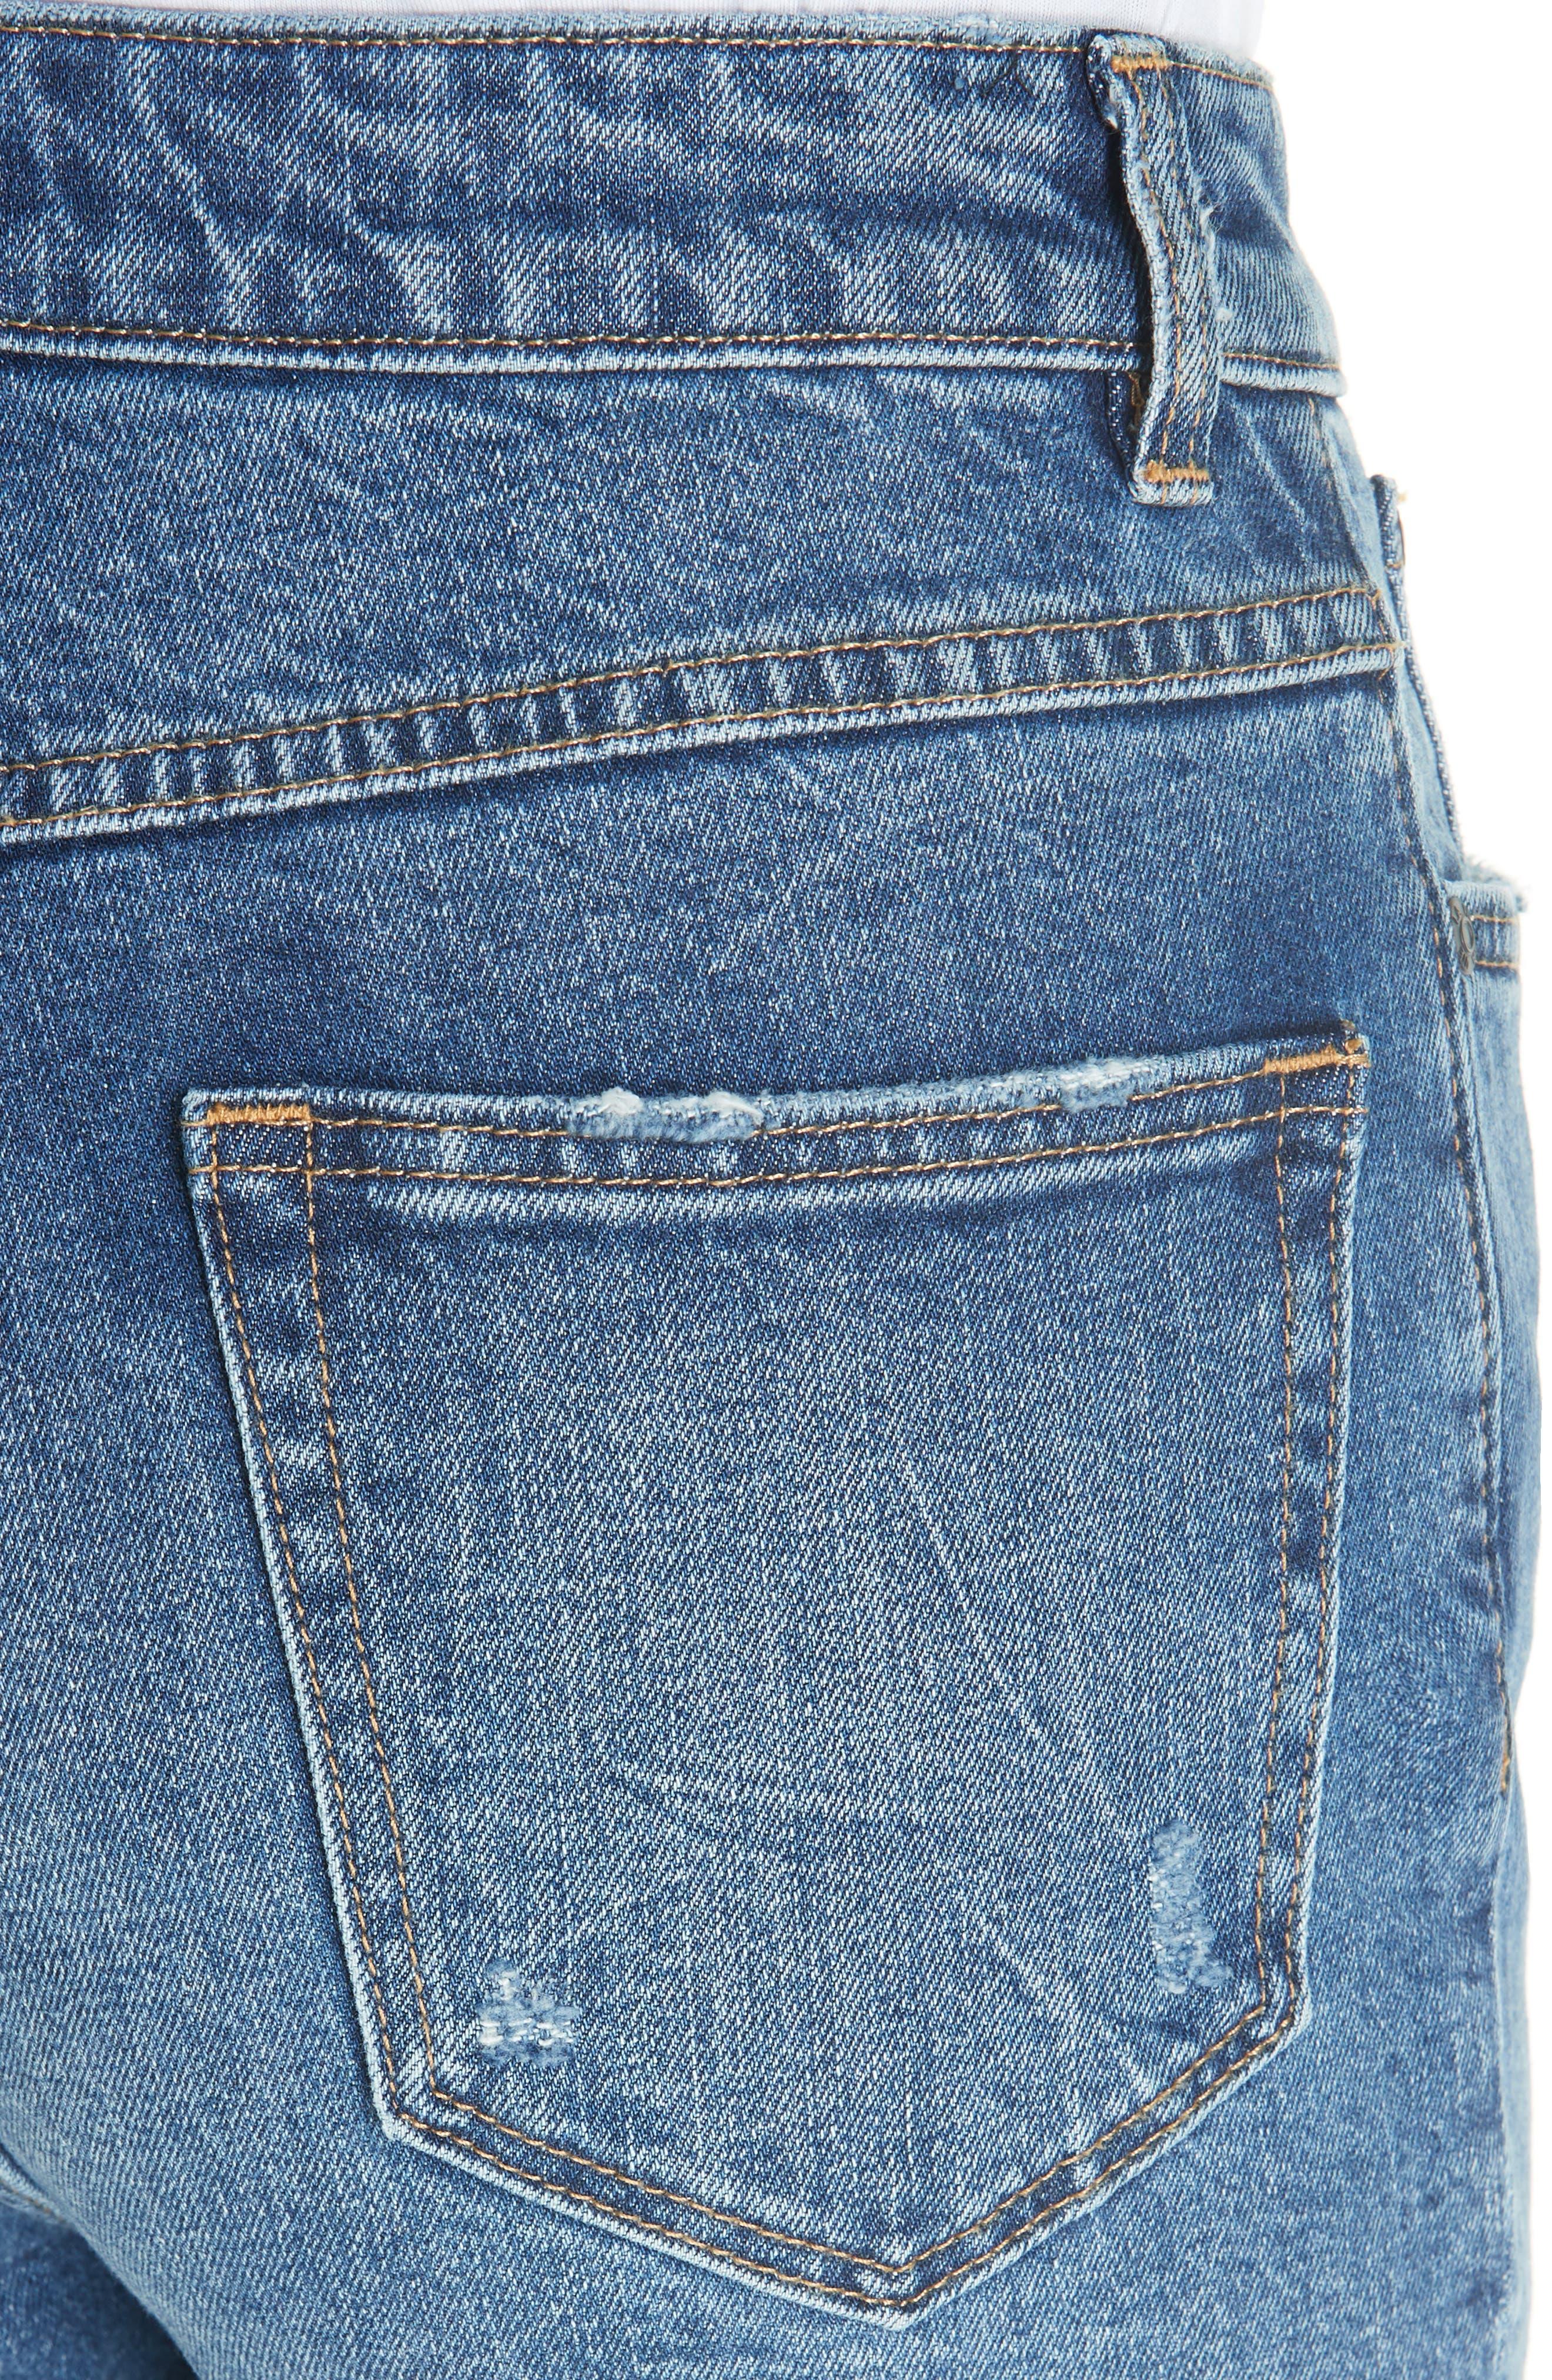 High Waist Straight Leg Jeans,                             Alternate thumbnail 4, color,                             GARWSH